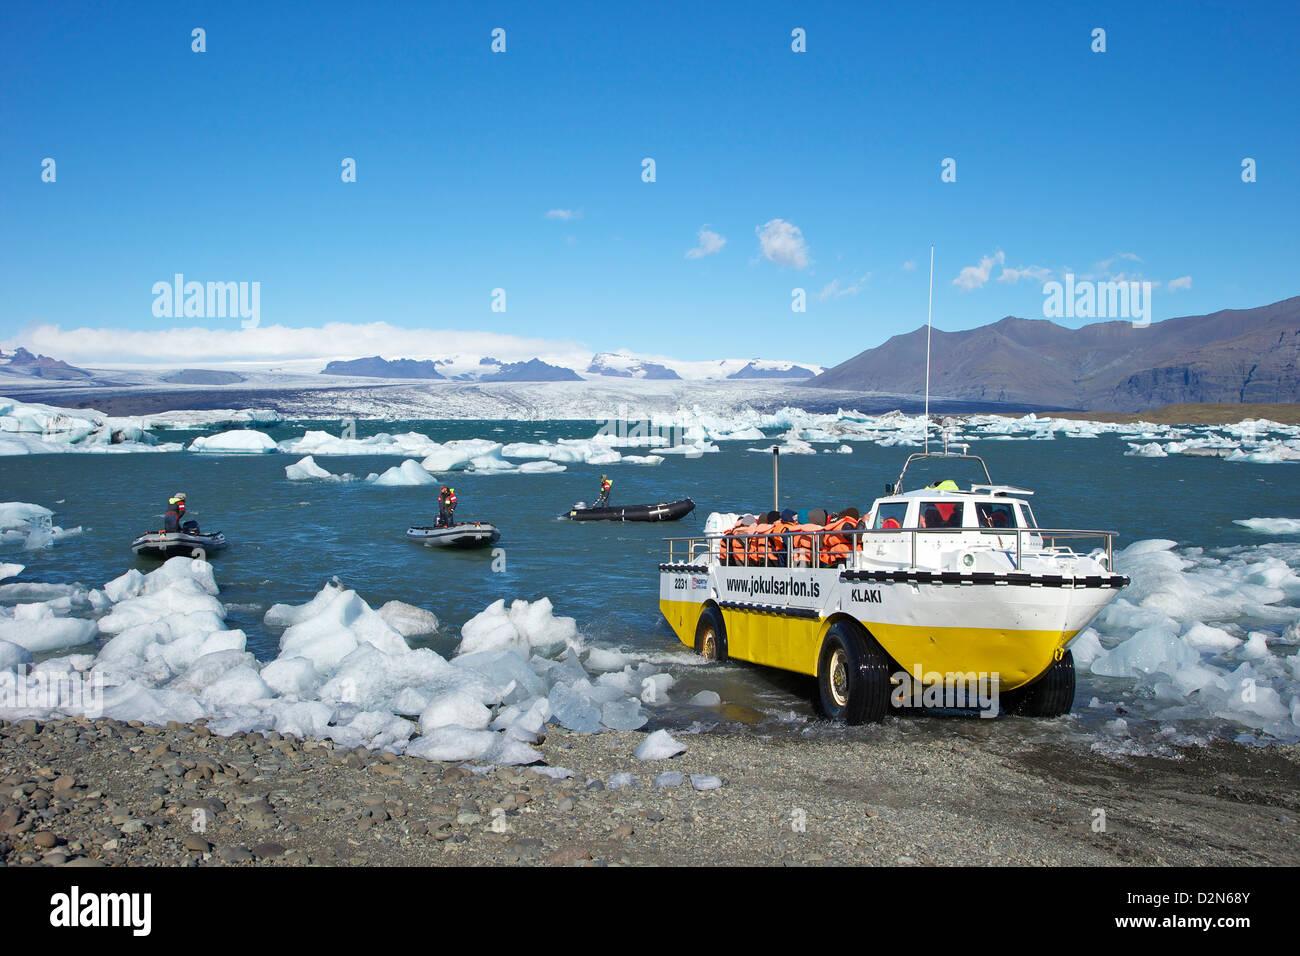 Amphibious boat and icebergs on glacial lake at Jokulsarlon with icecap of Vatnajokull behind, Iceland, Polar Regions - Stock Image